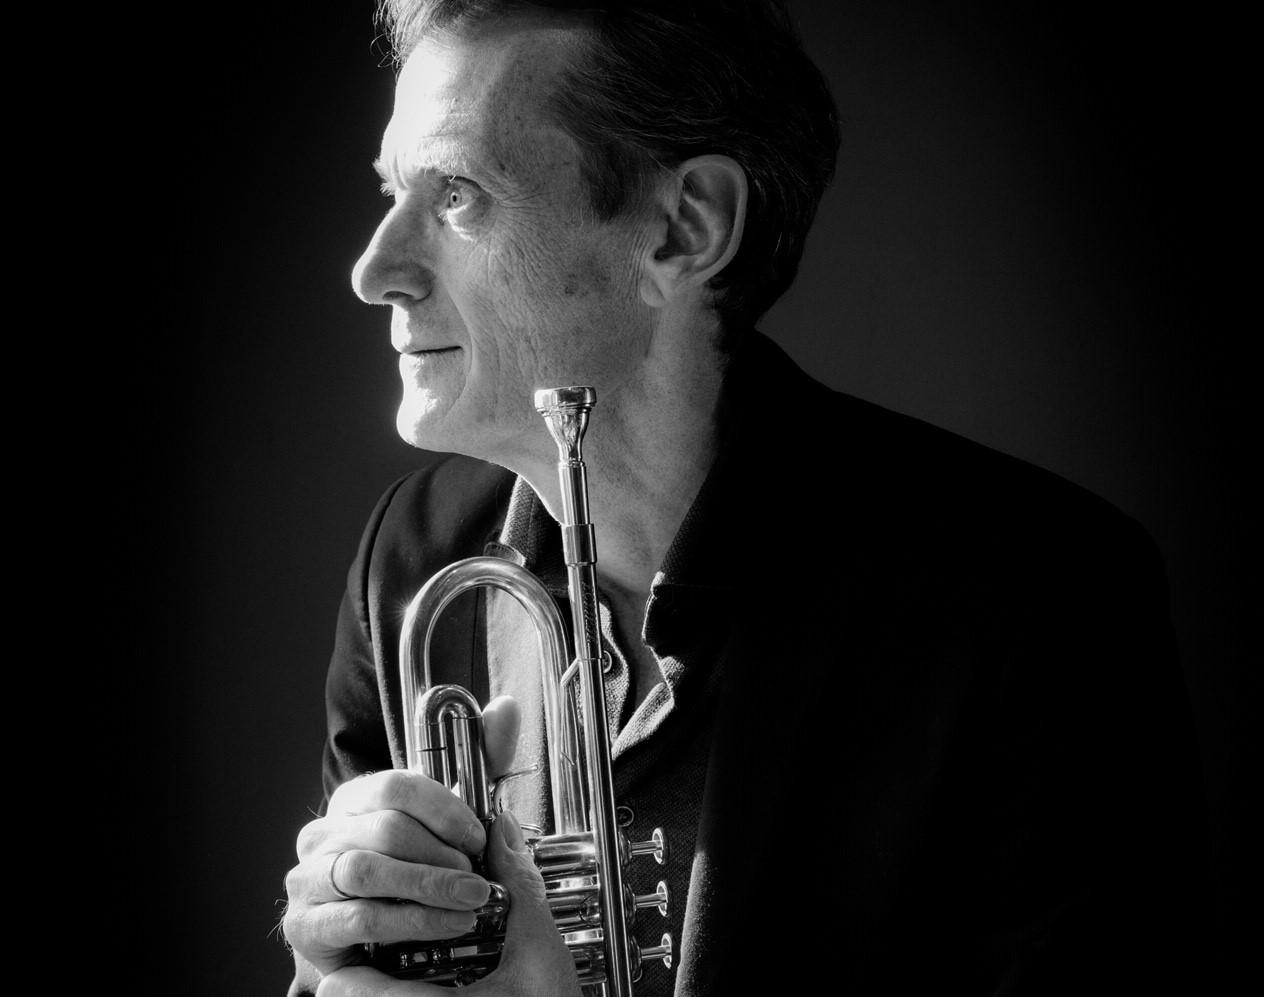 Heritage Sinfonietta featuring Ruud Breuls